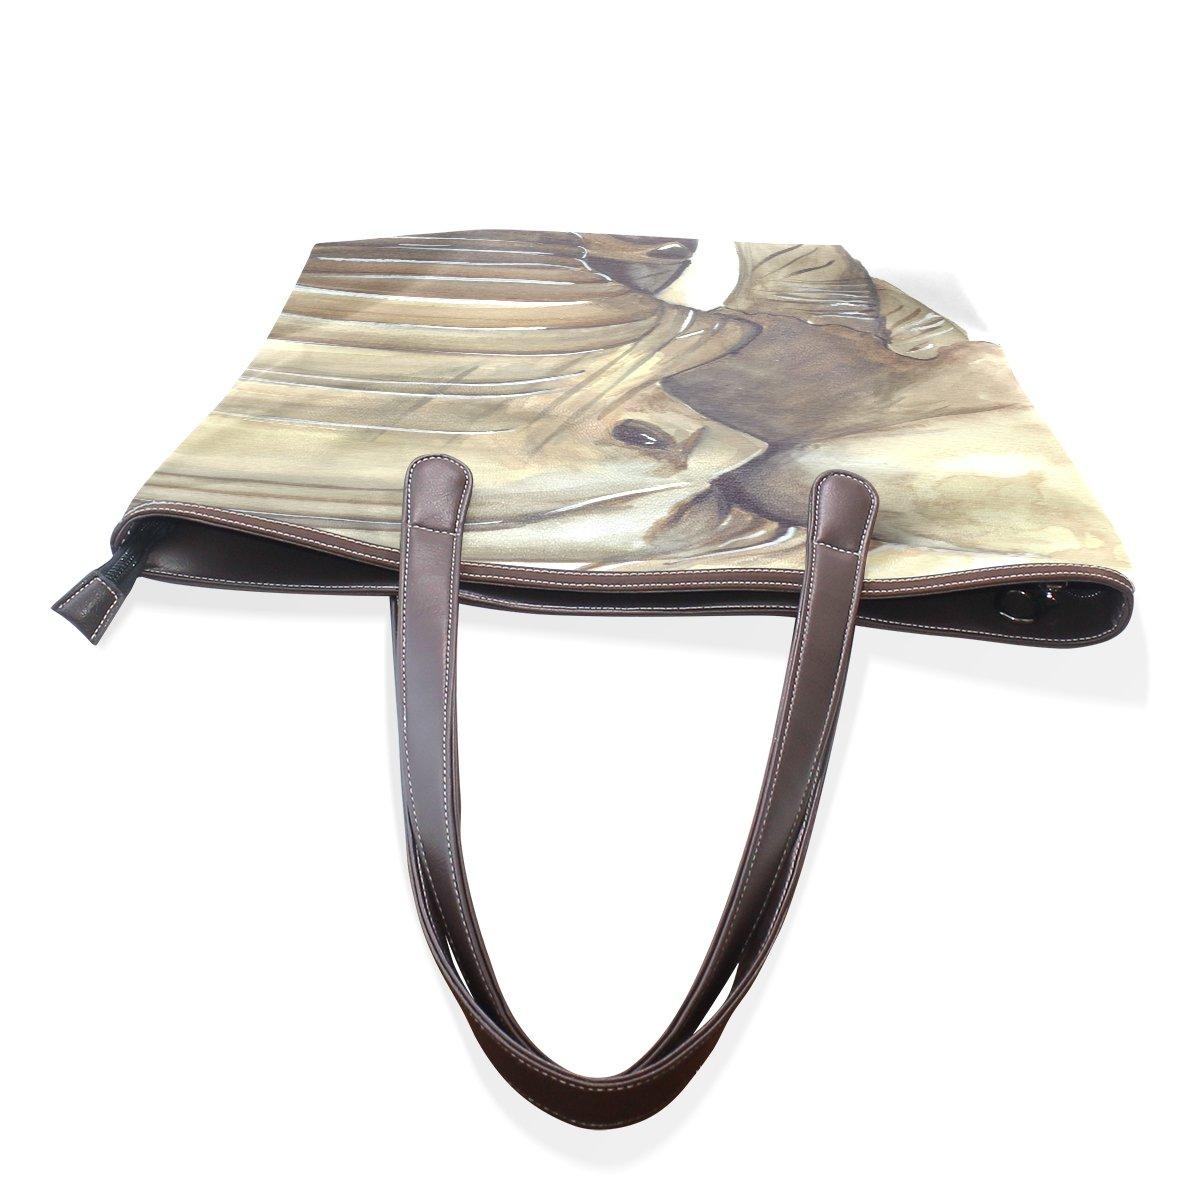 SCDS Abstract The Elephant PU Leather Lady Handbag Tote Bag Zipper Shoulder Bag